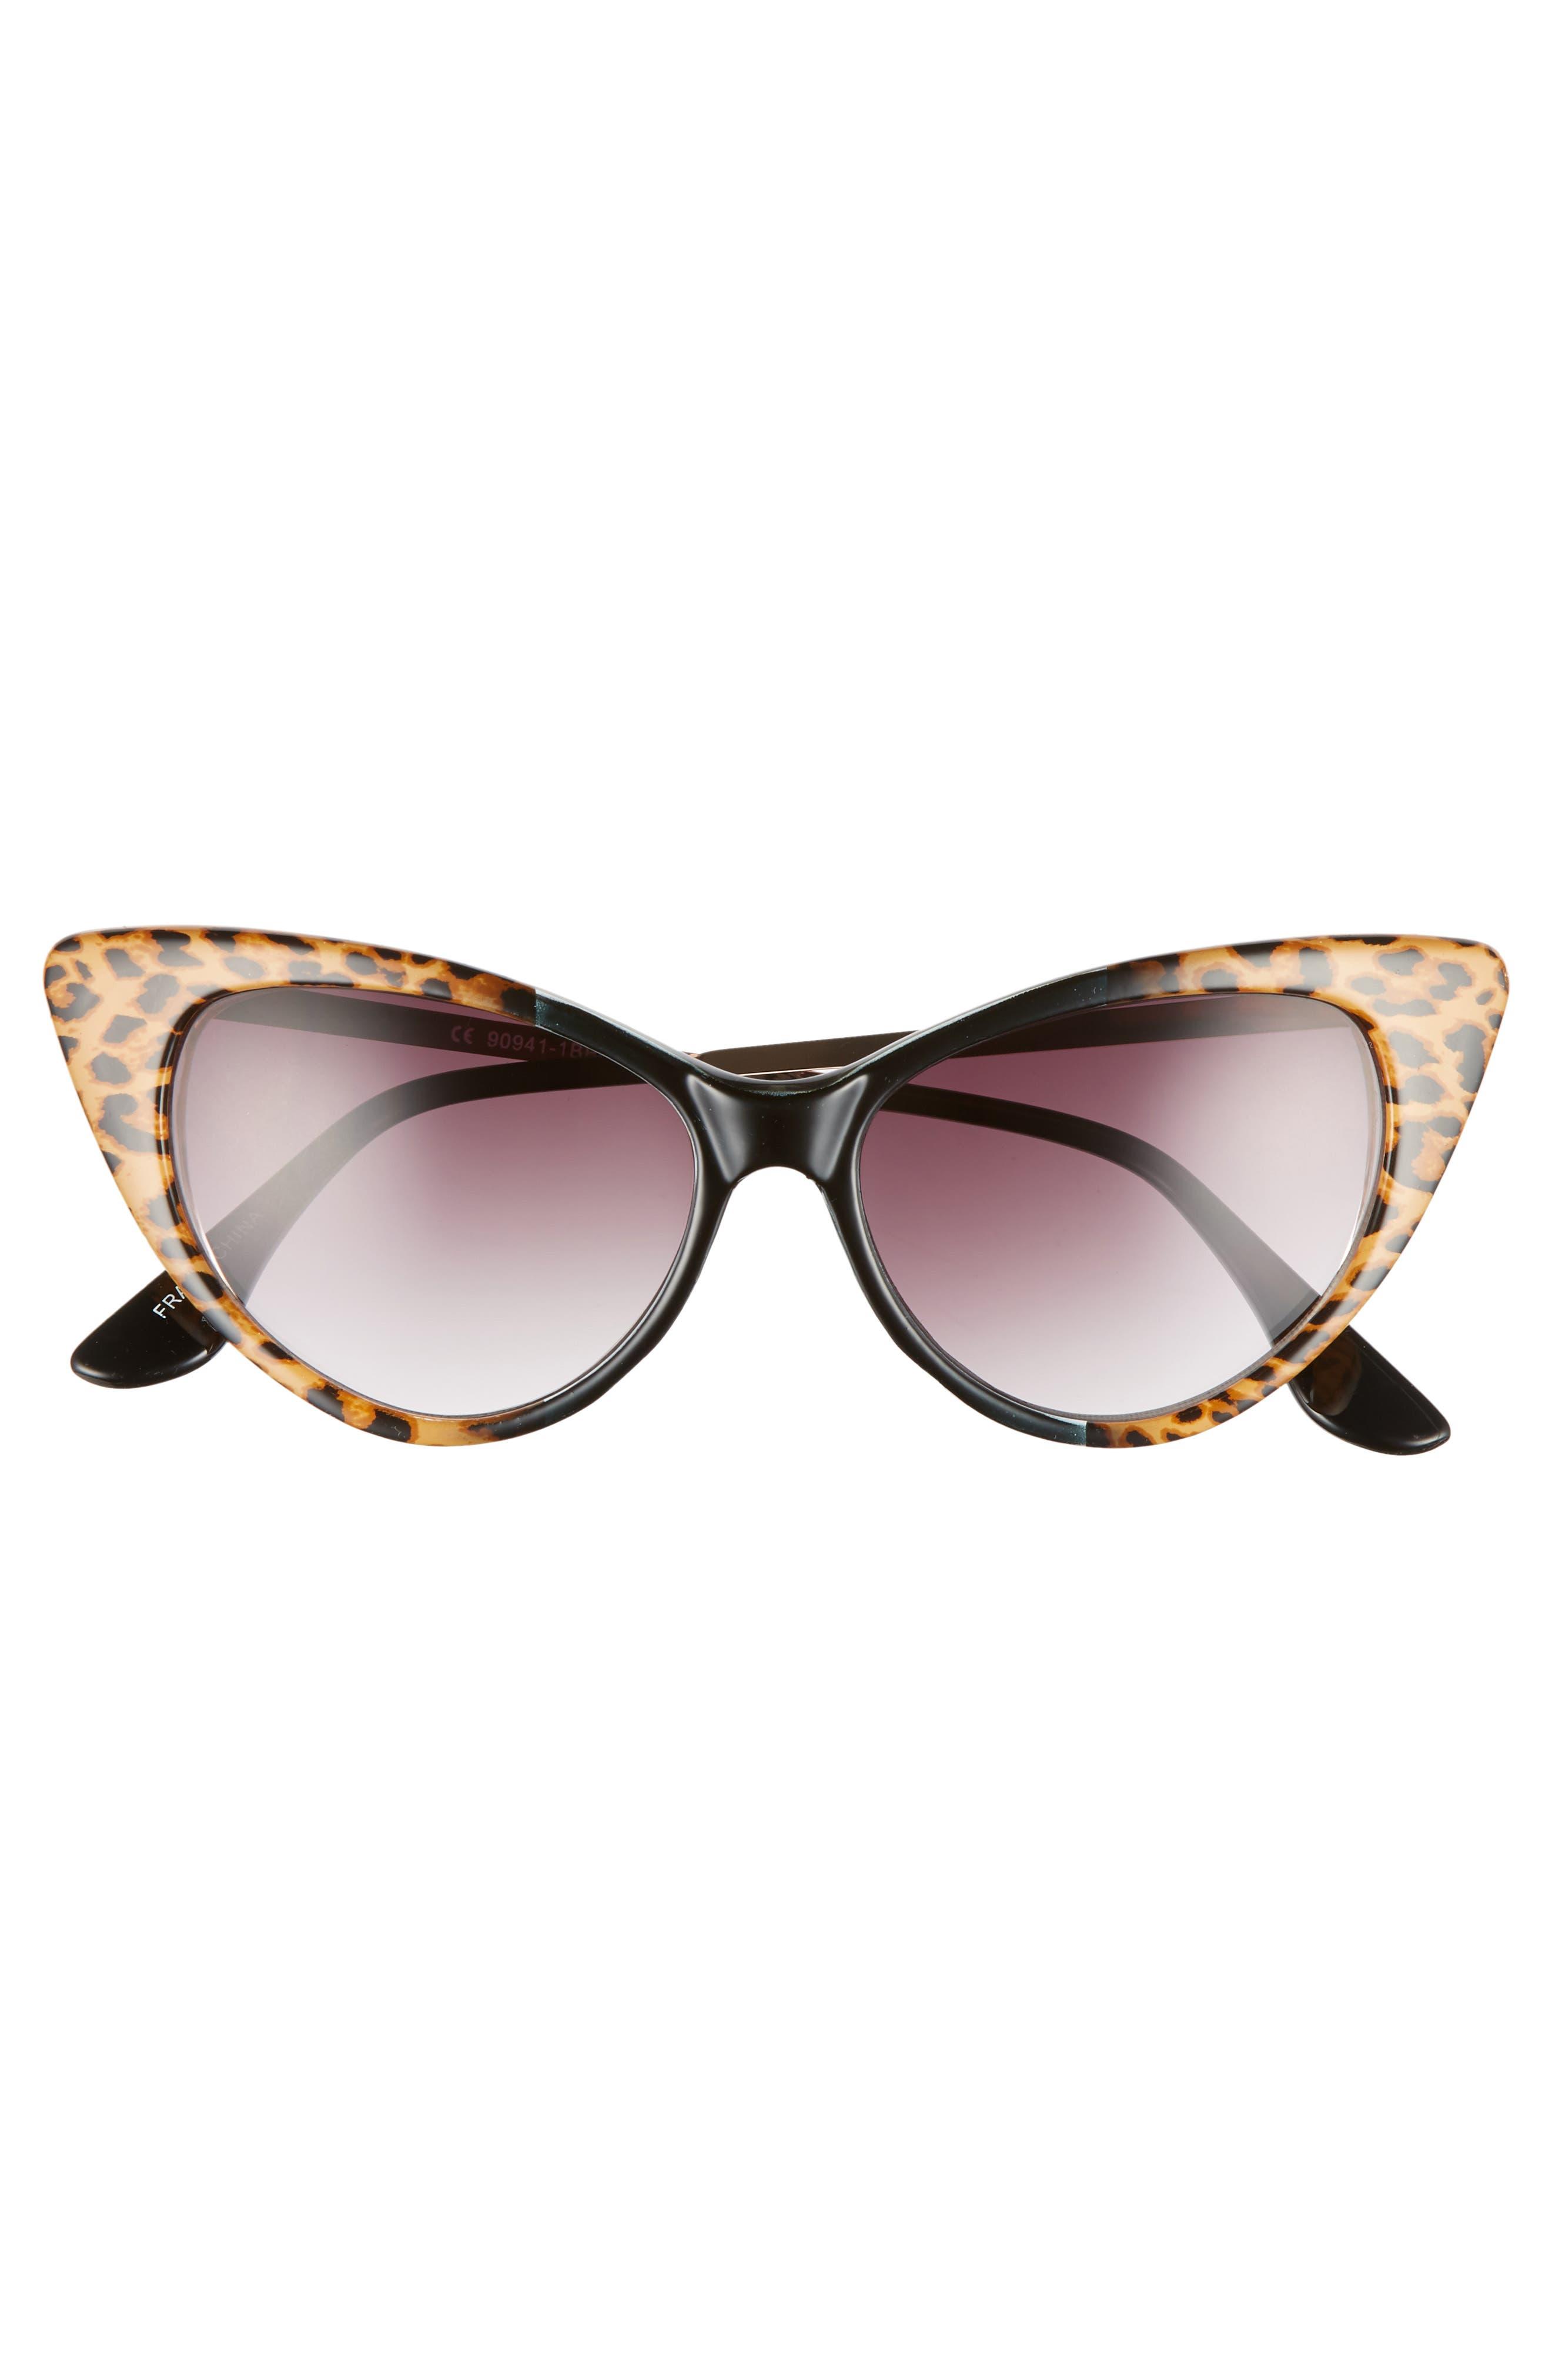 GLANCE EYEWEAR,                             62mm Leopard Print Cat Eye Sunglasses,                             Alternate thumbnail 3, color,                             001